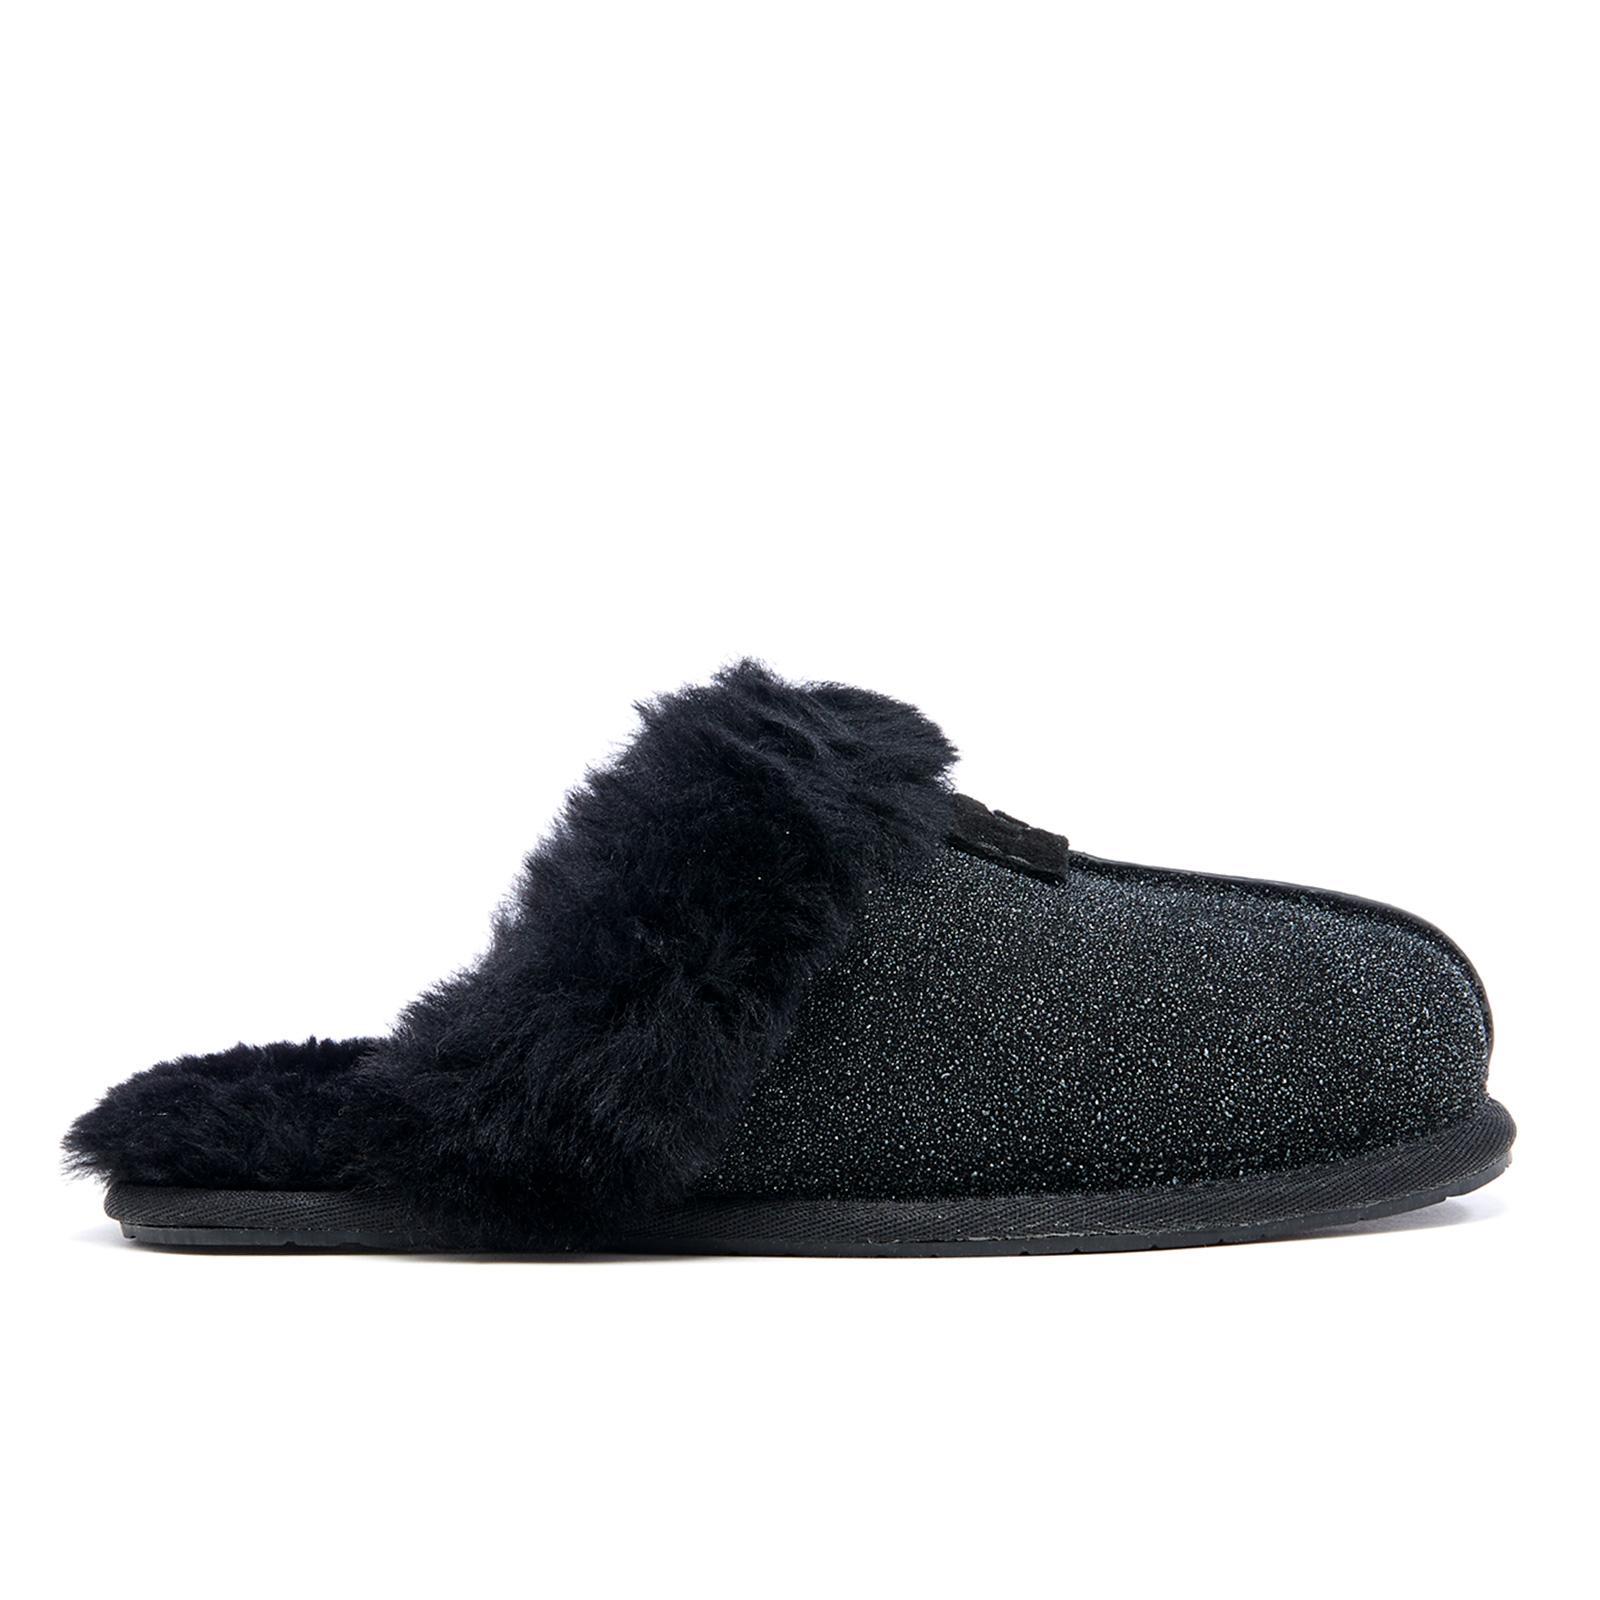 ae789732b67 UGG Women's Scuffette II Serein Shimmer Suede Slippers - Black